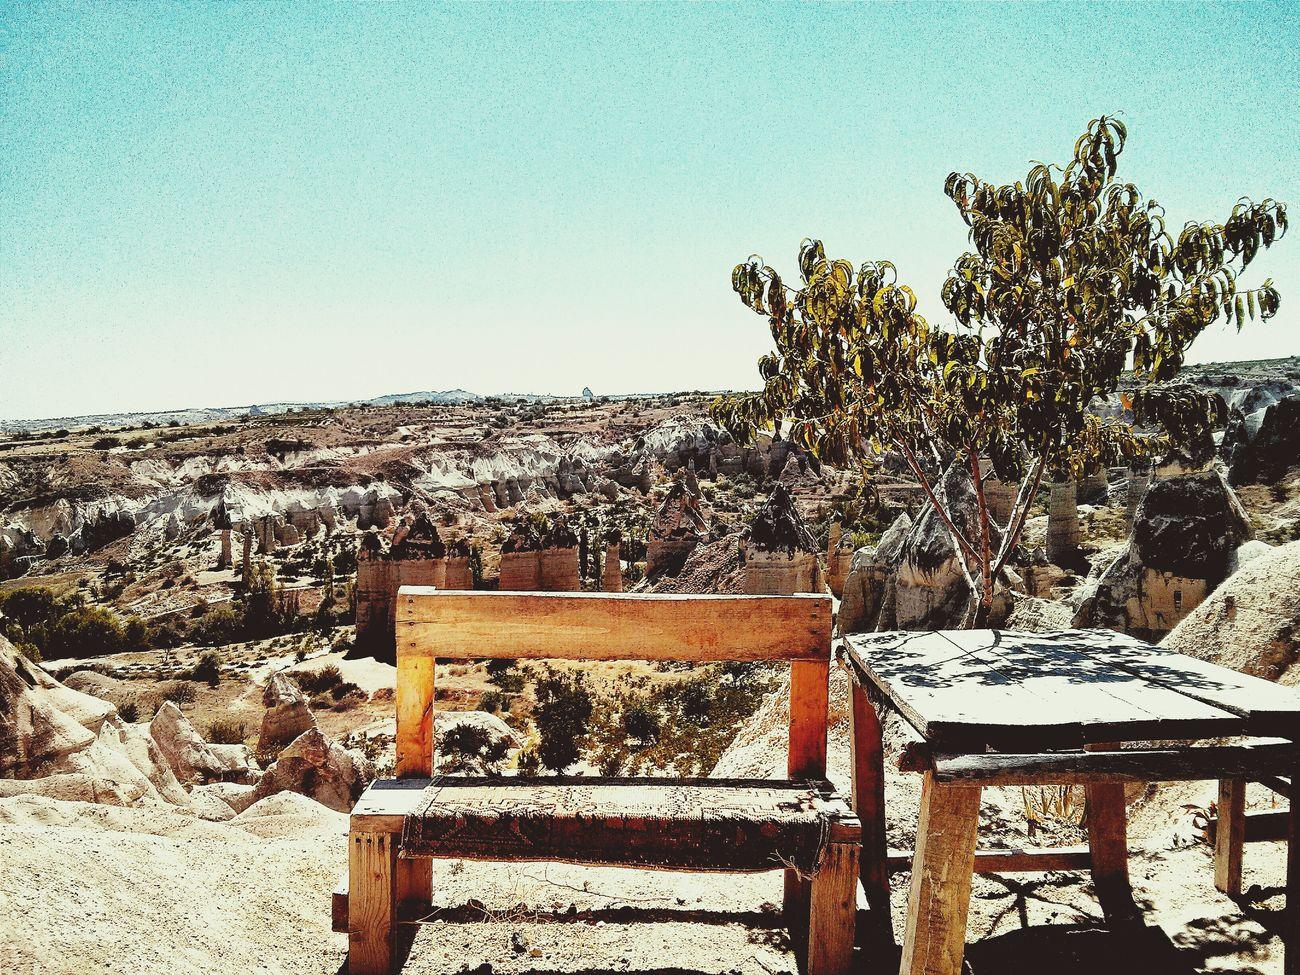 take a seat - Landscape Enjoying Life Relaxing Seeing The World